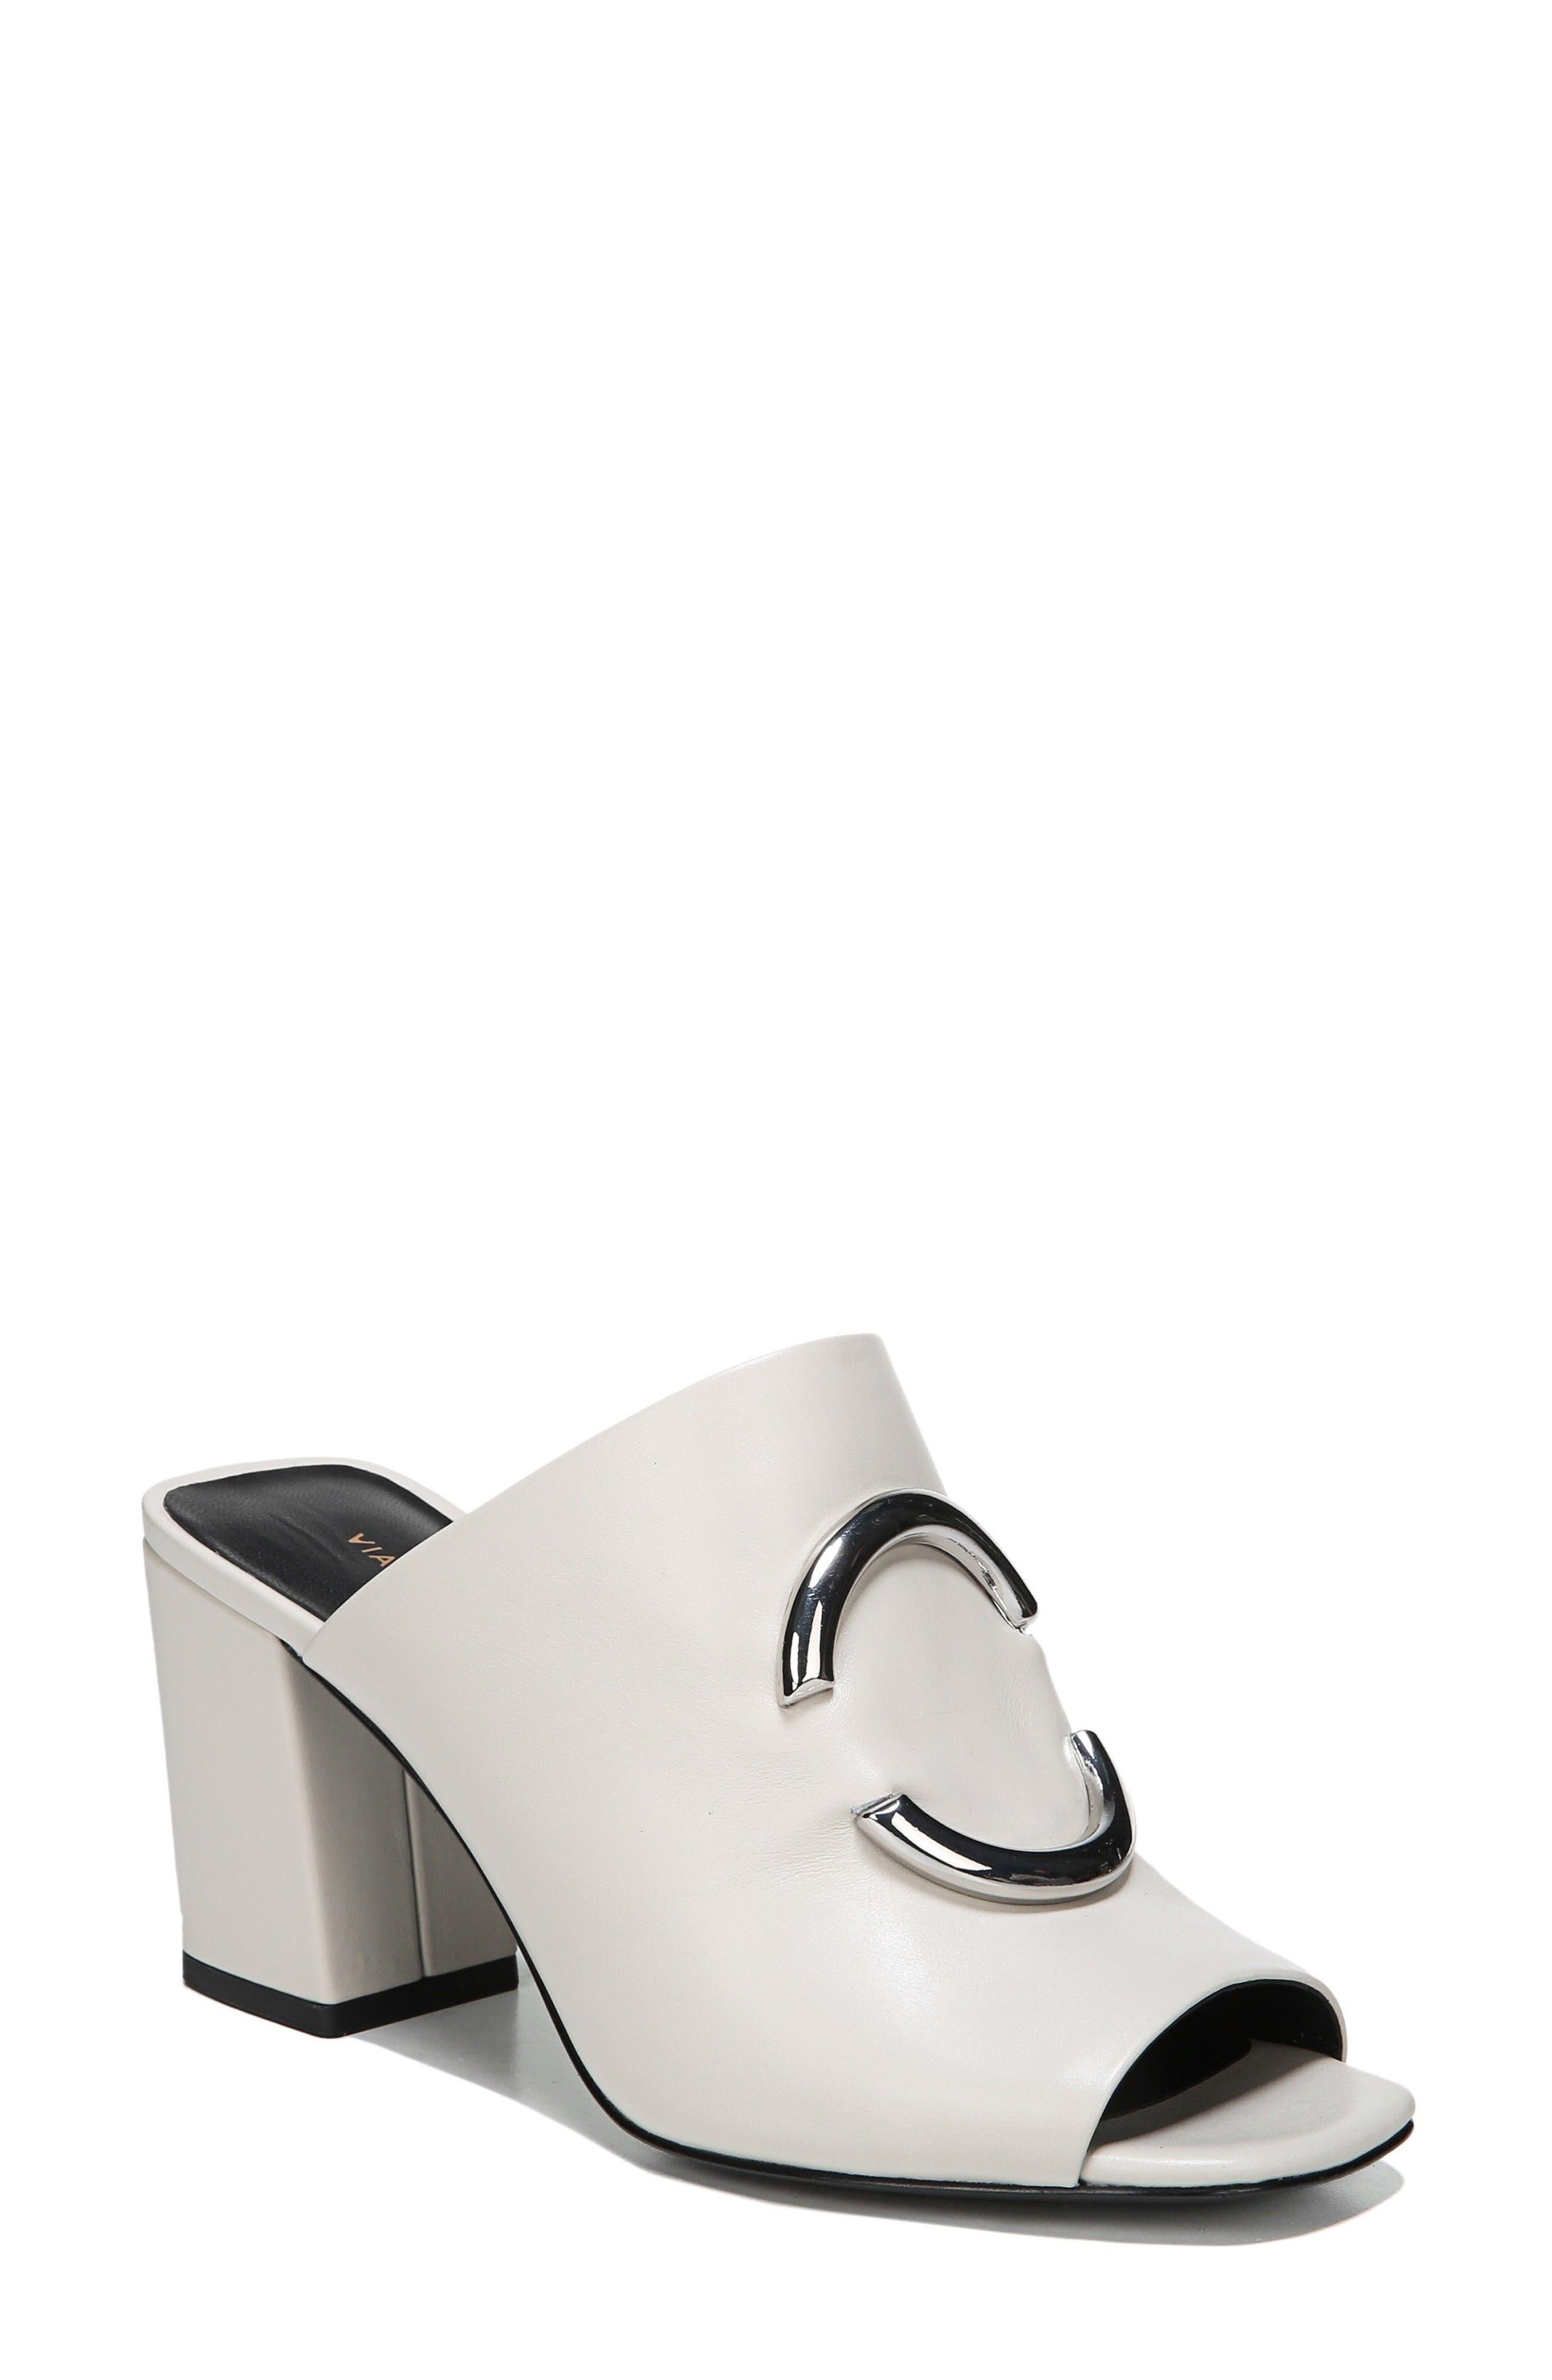 Eleni Slide Sandal,                         Main,                         color,